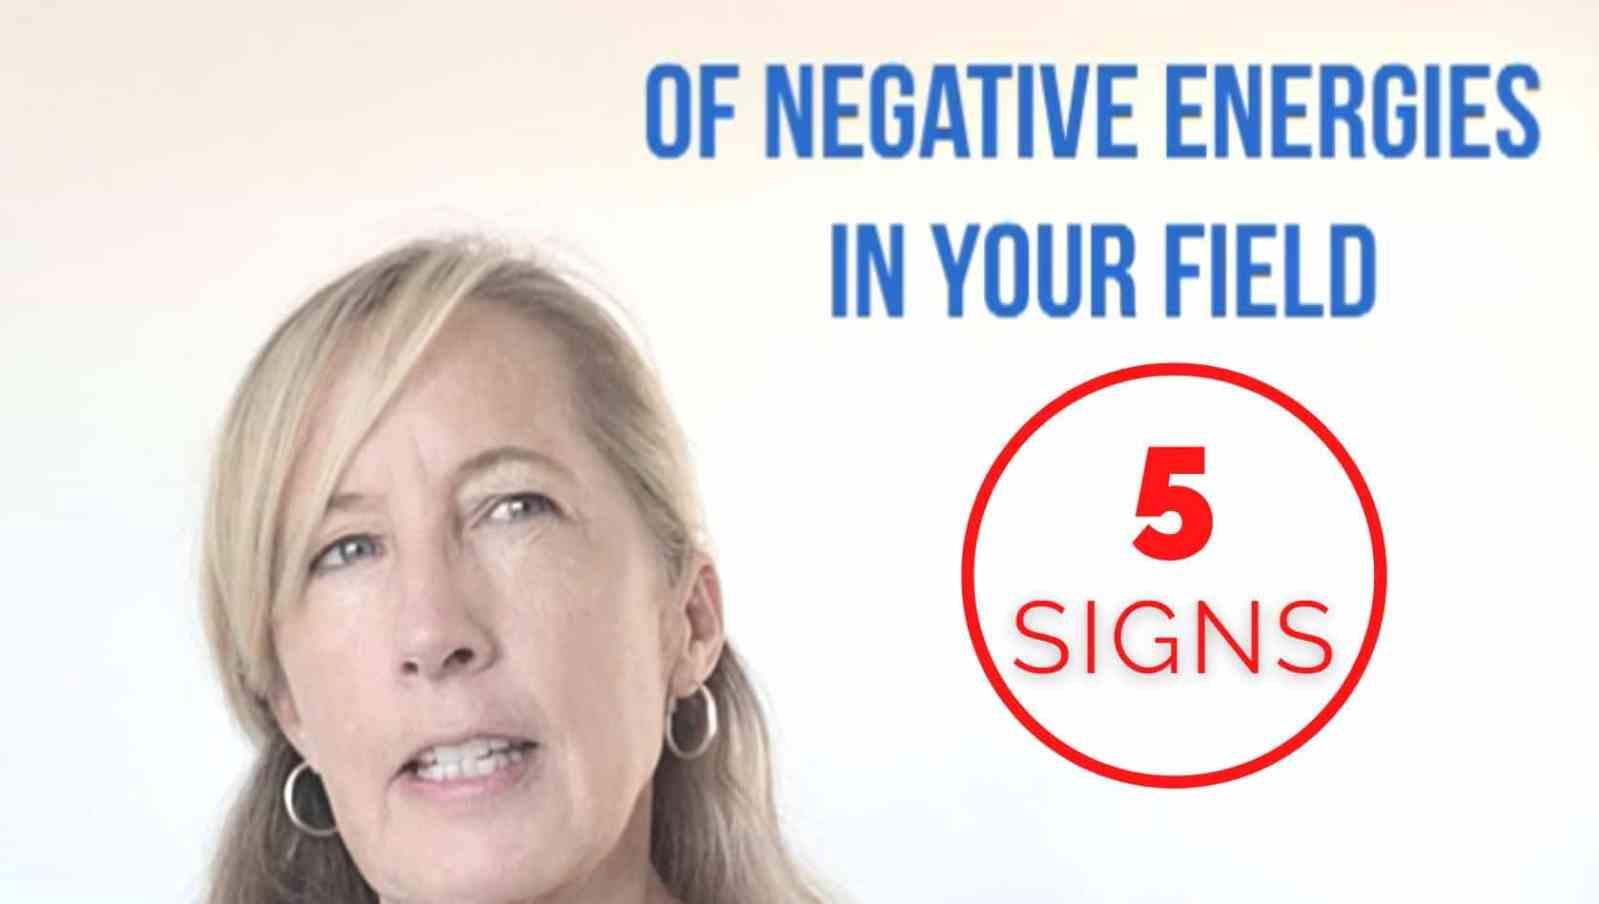 5 Signs of Negative Energies